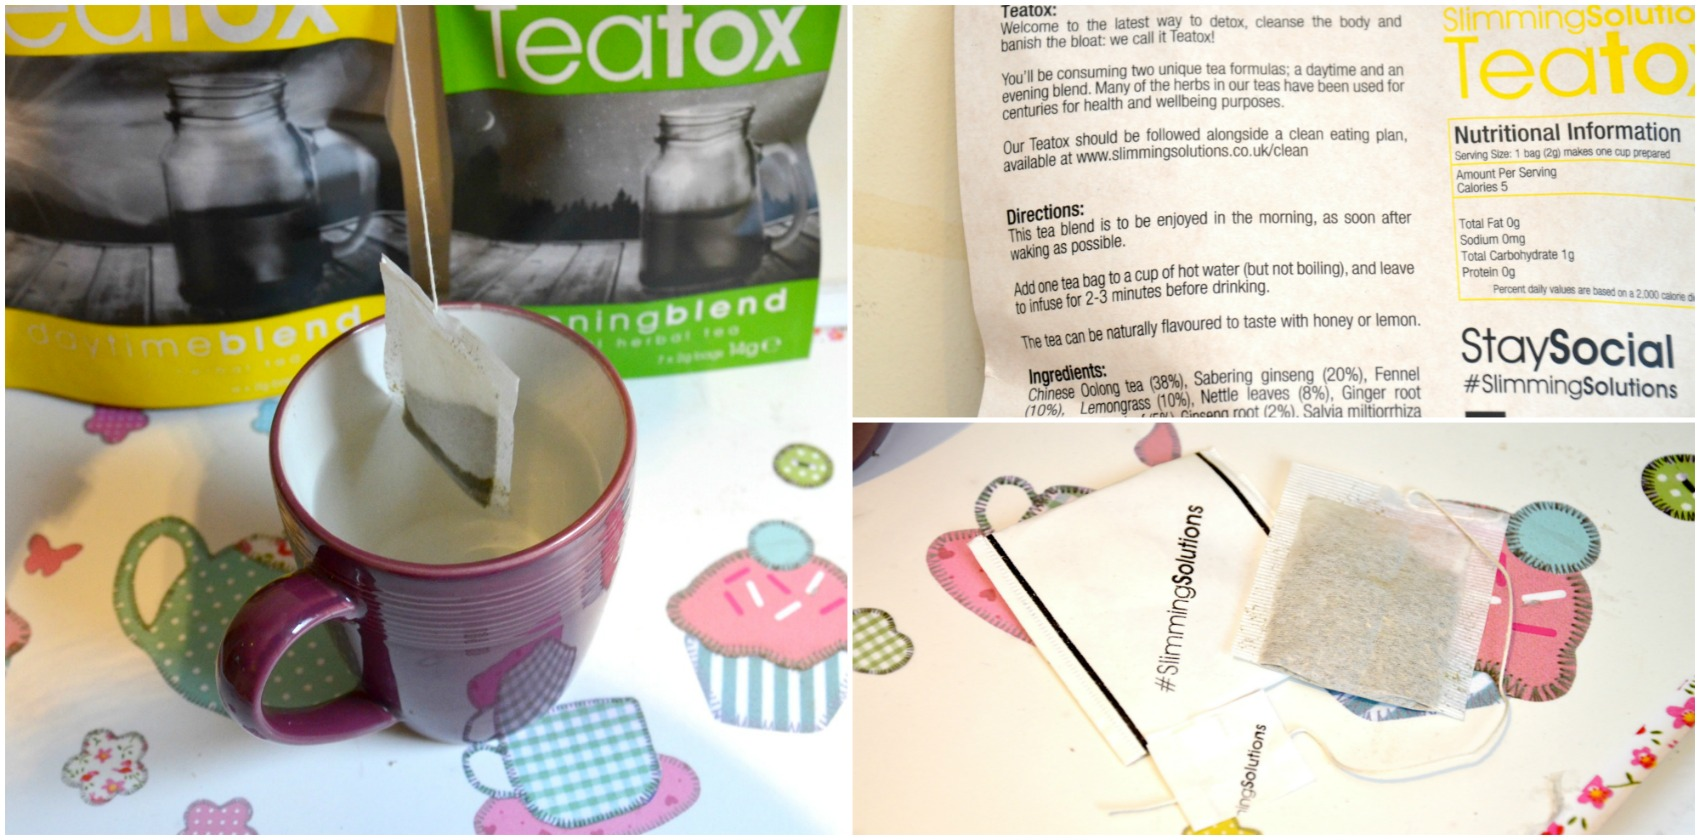 making teatox